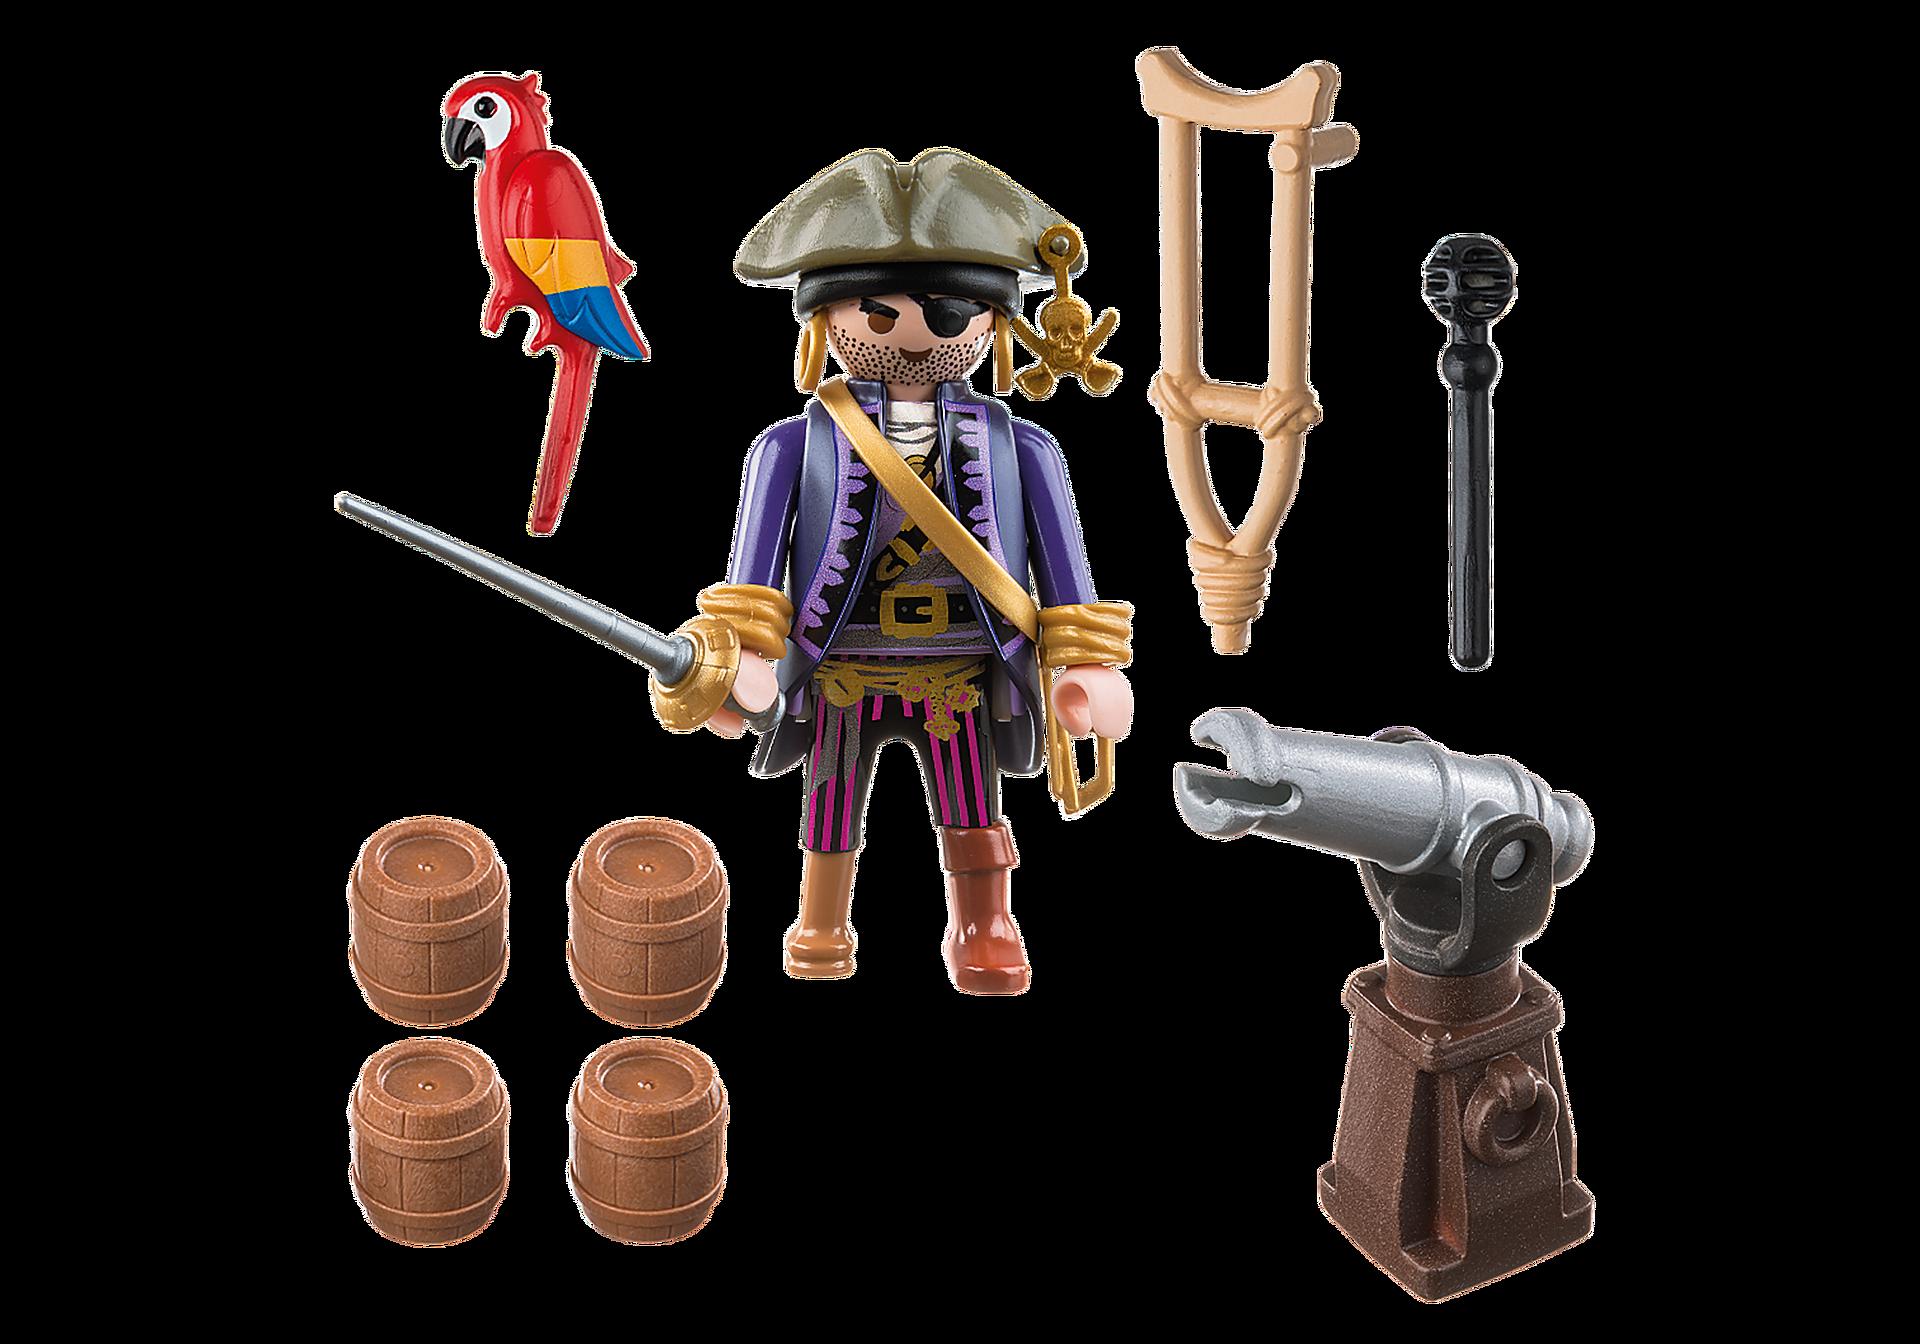 6684 Piratenkapitein Eénoog zoom image3